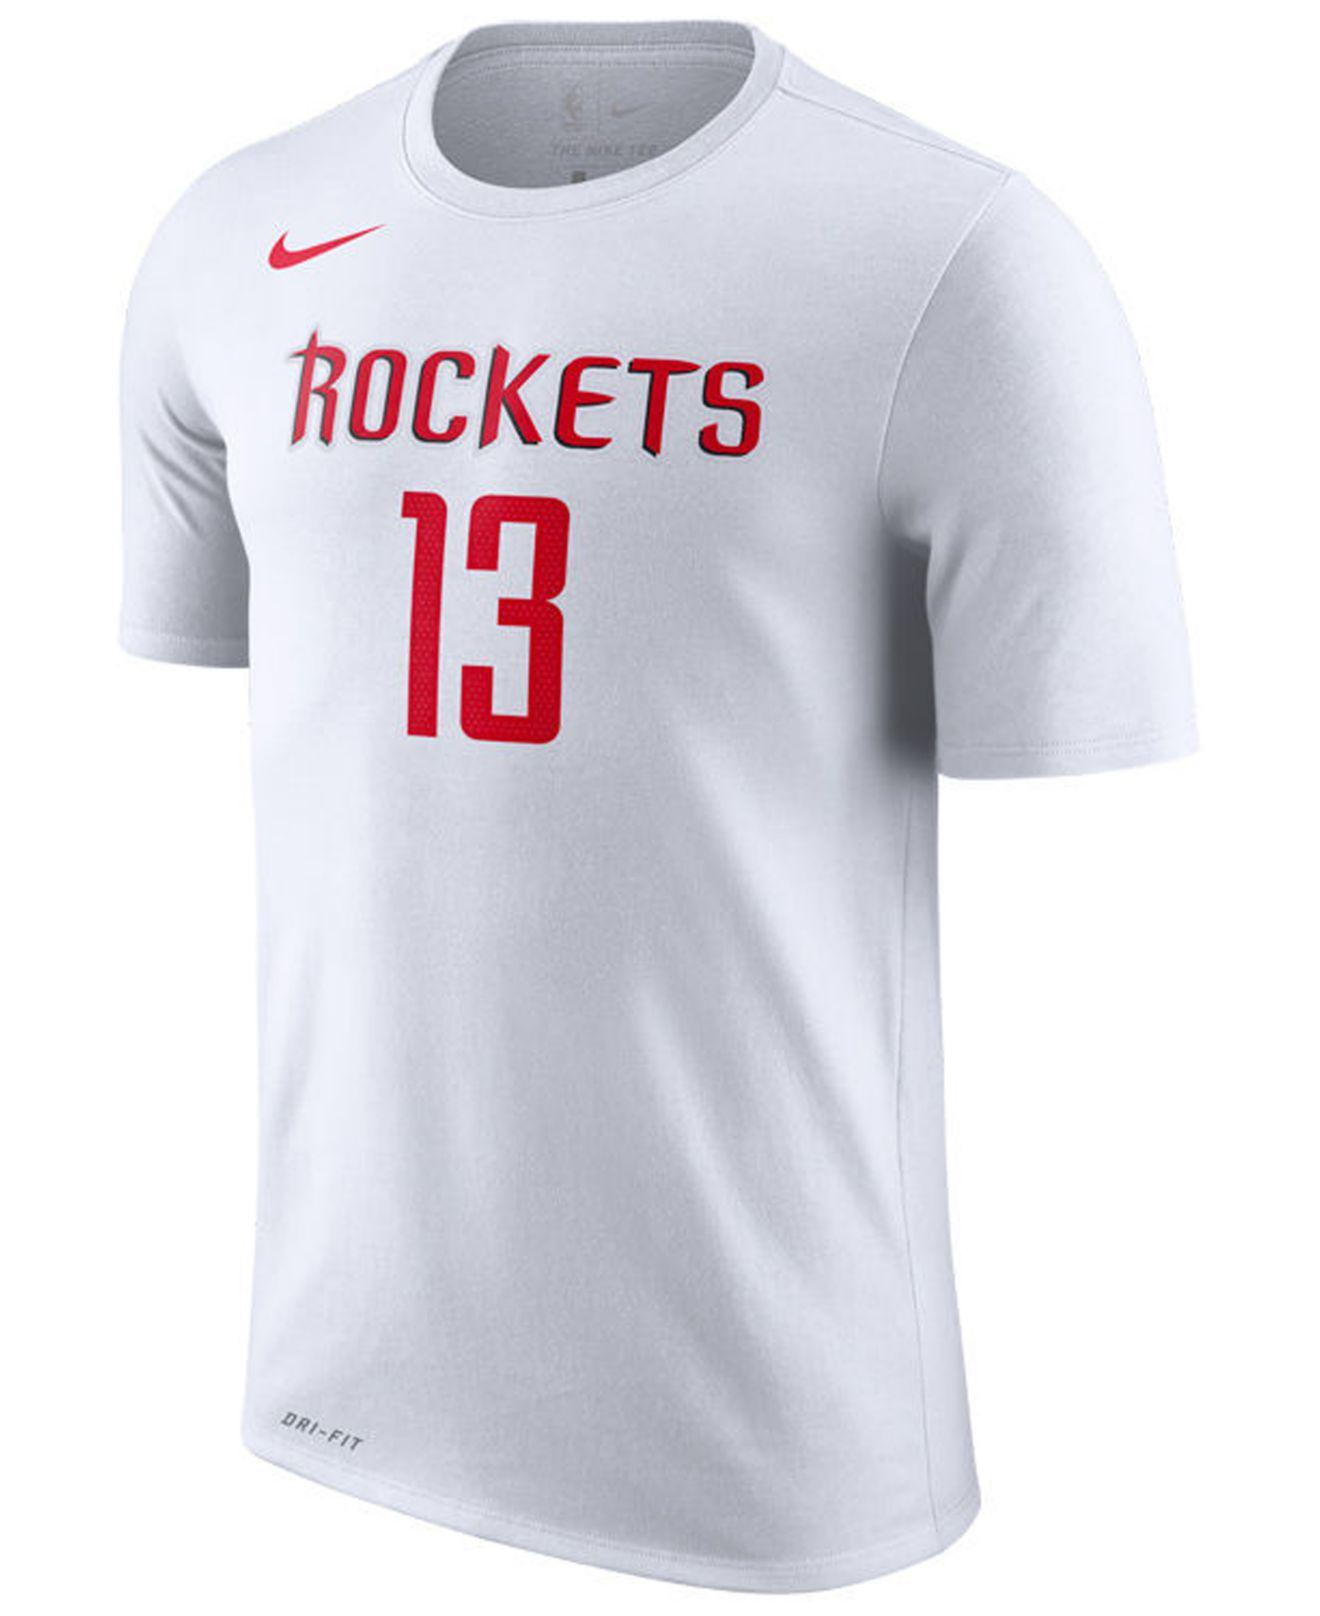 1c2aff14 Nike James Harden Houston Rockets Association Player T-shirt in White for  Men - Lyst